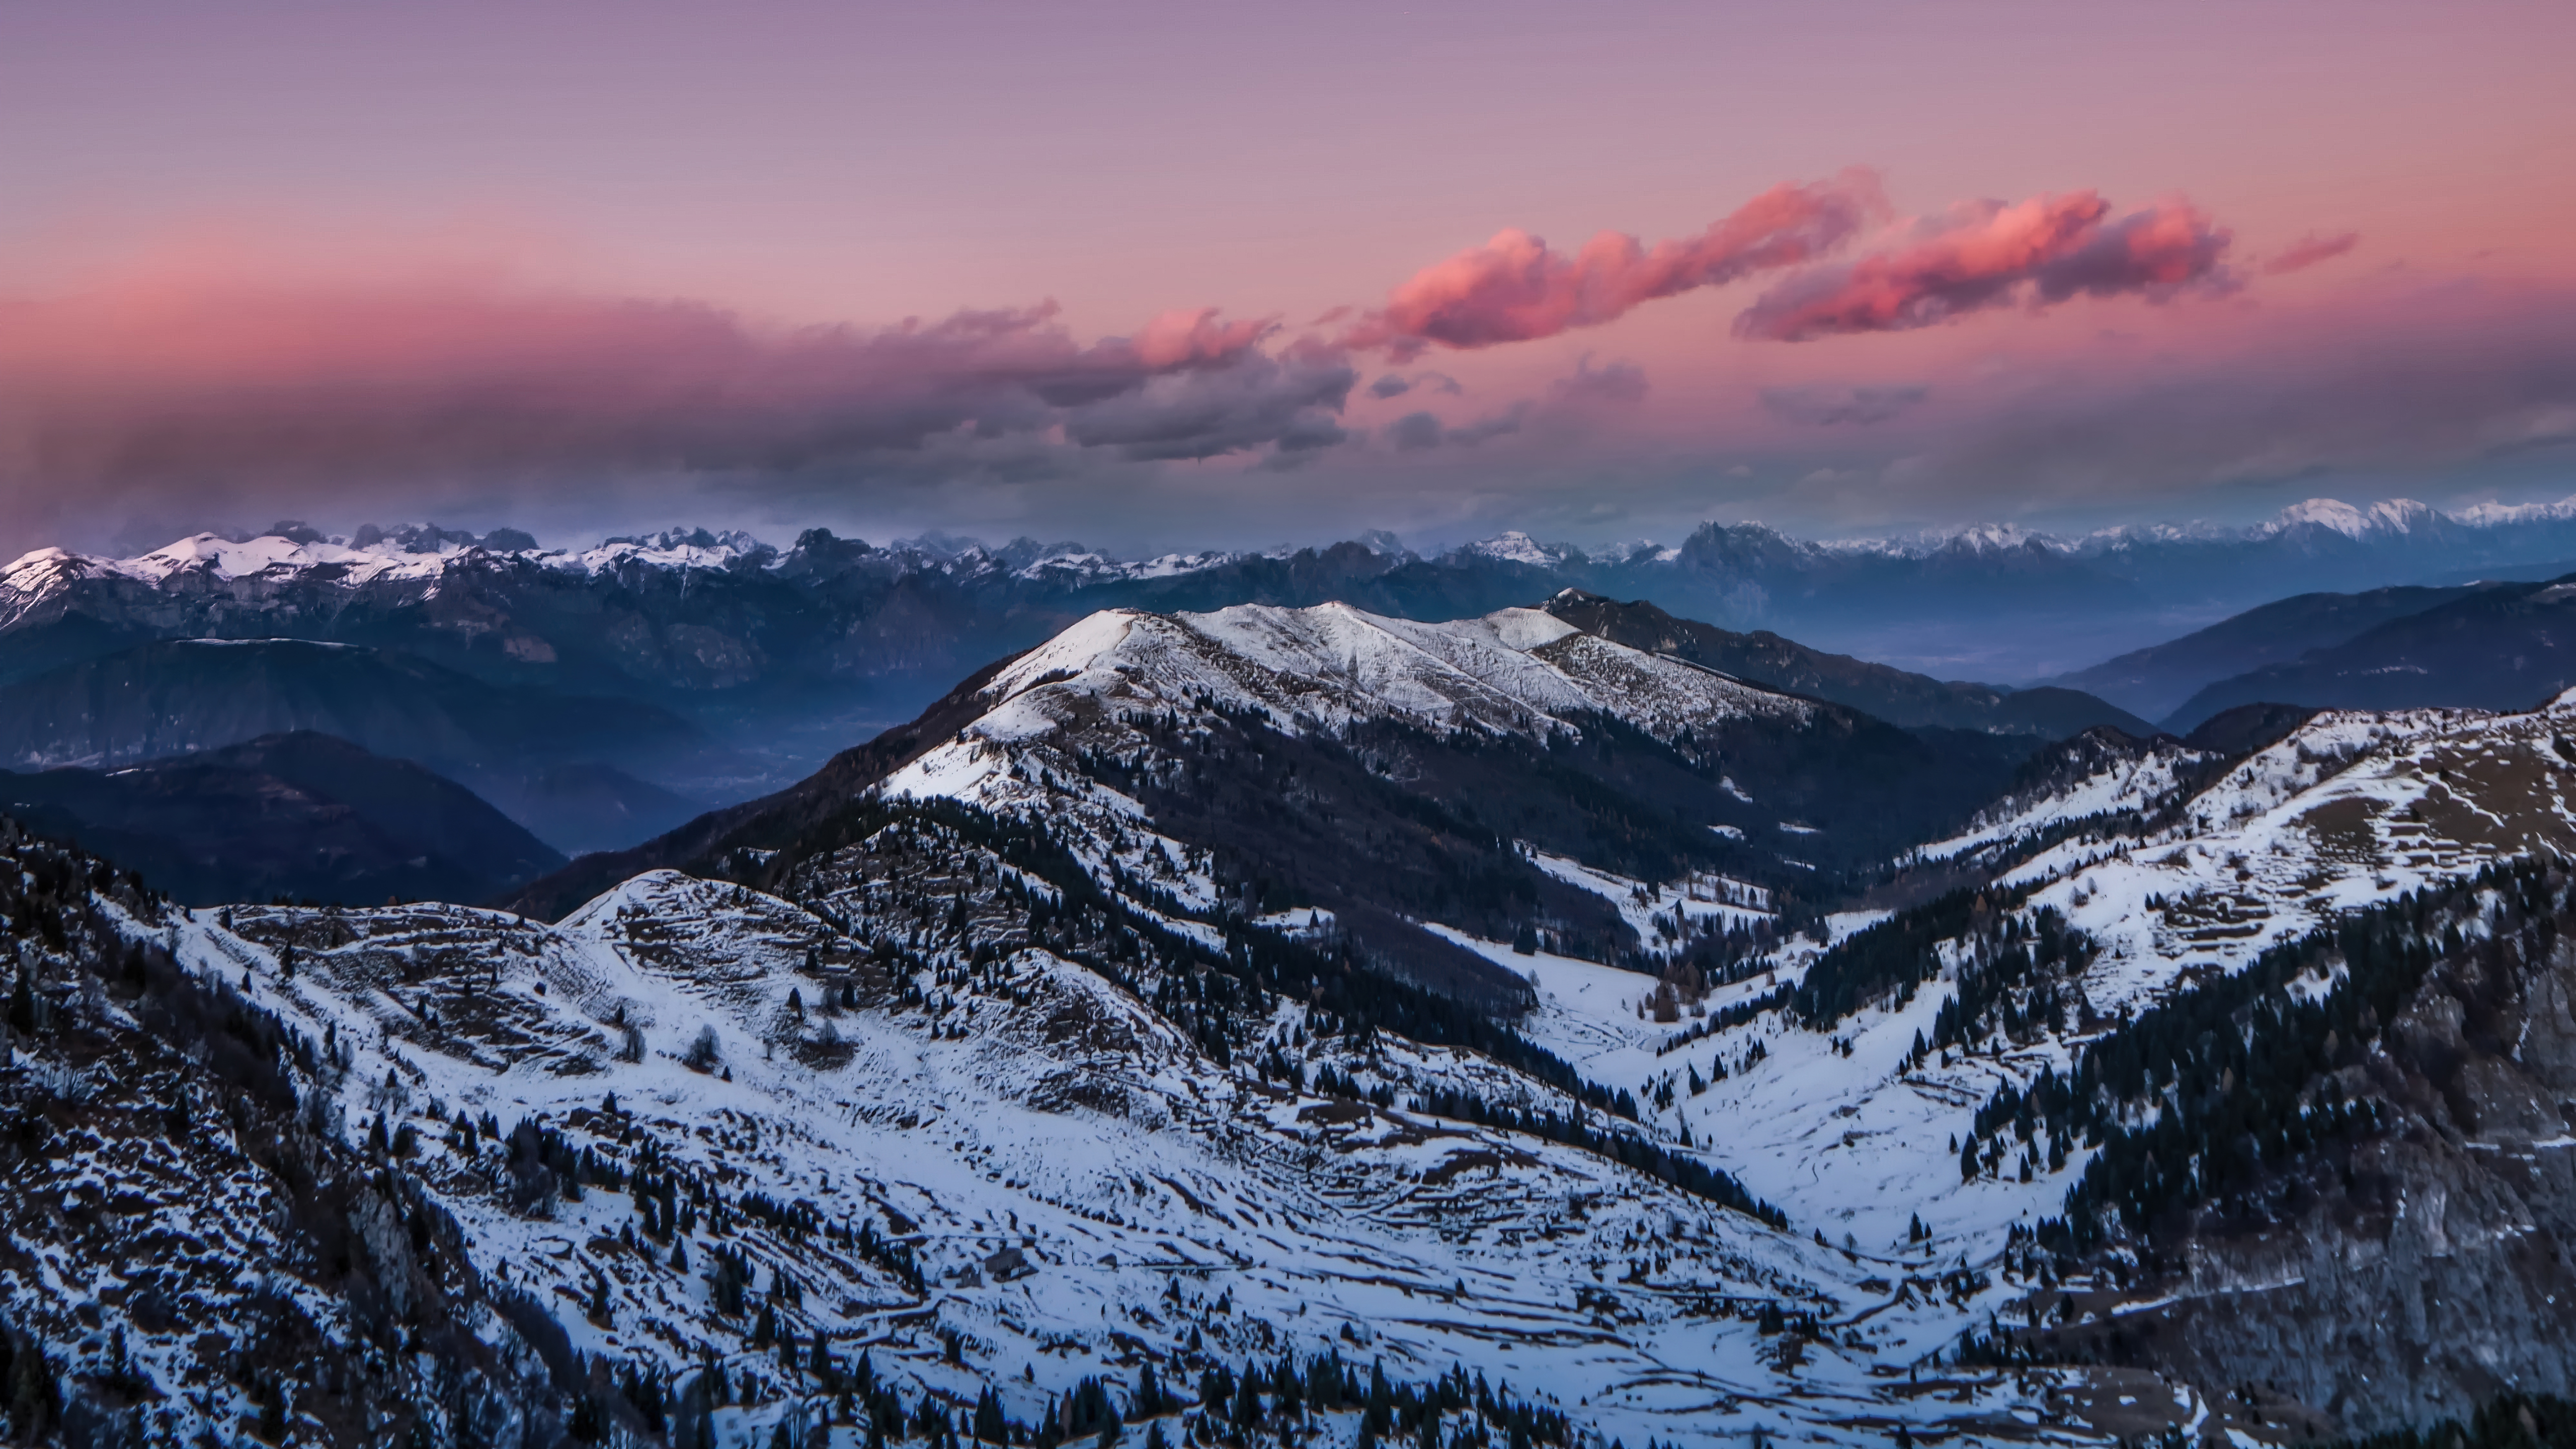 Wallpaper Mountains on pink sunset